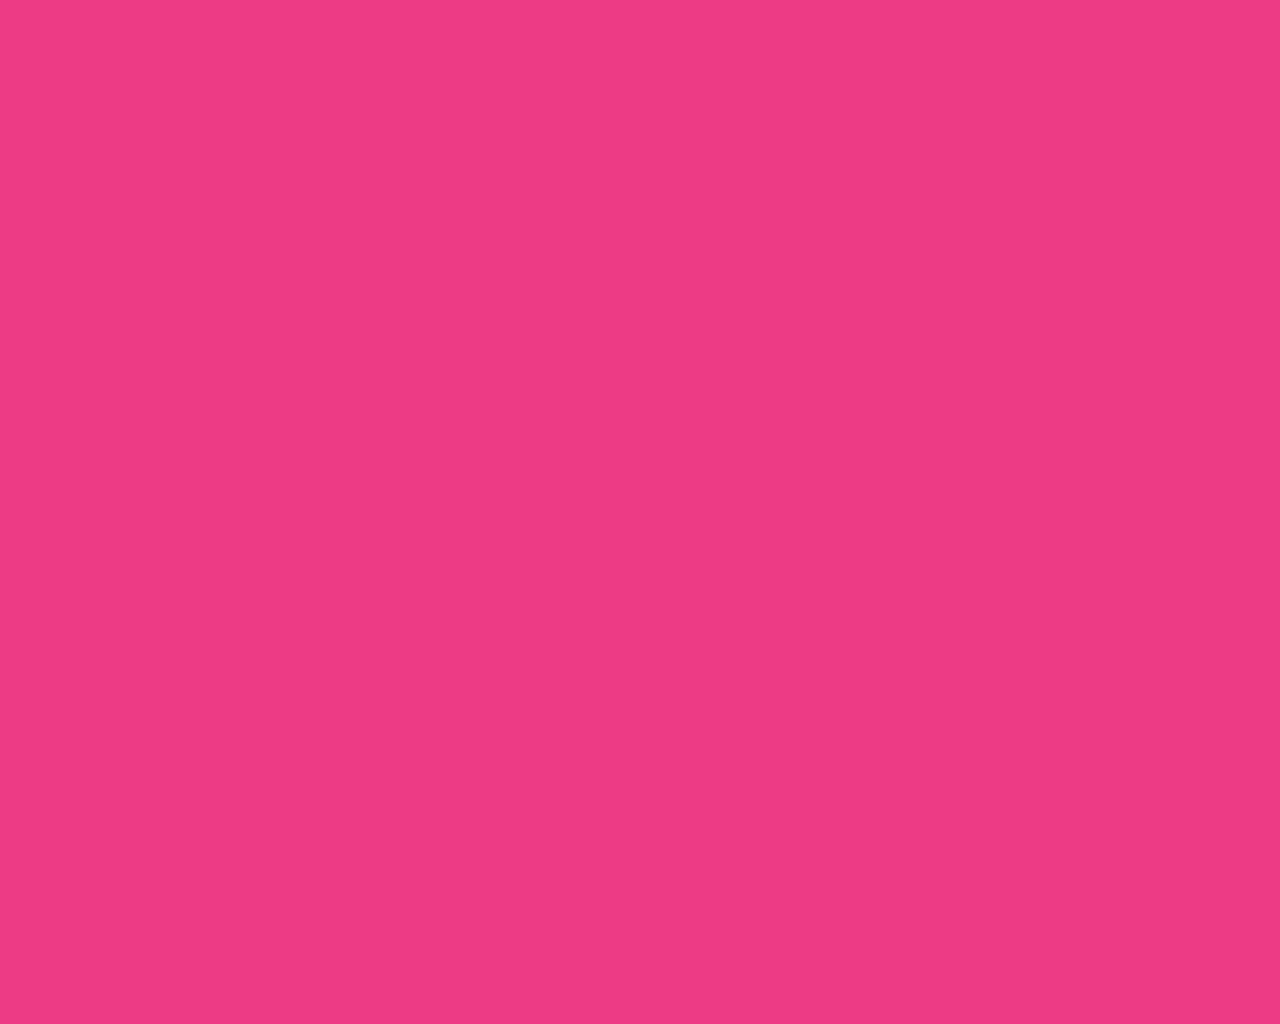 1280x1024 Cerise Pink Solid Color Background